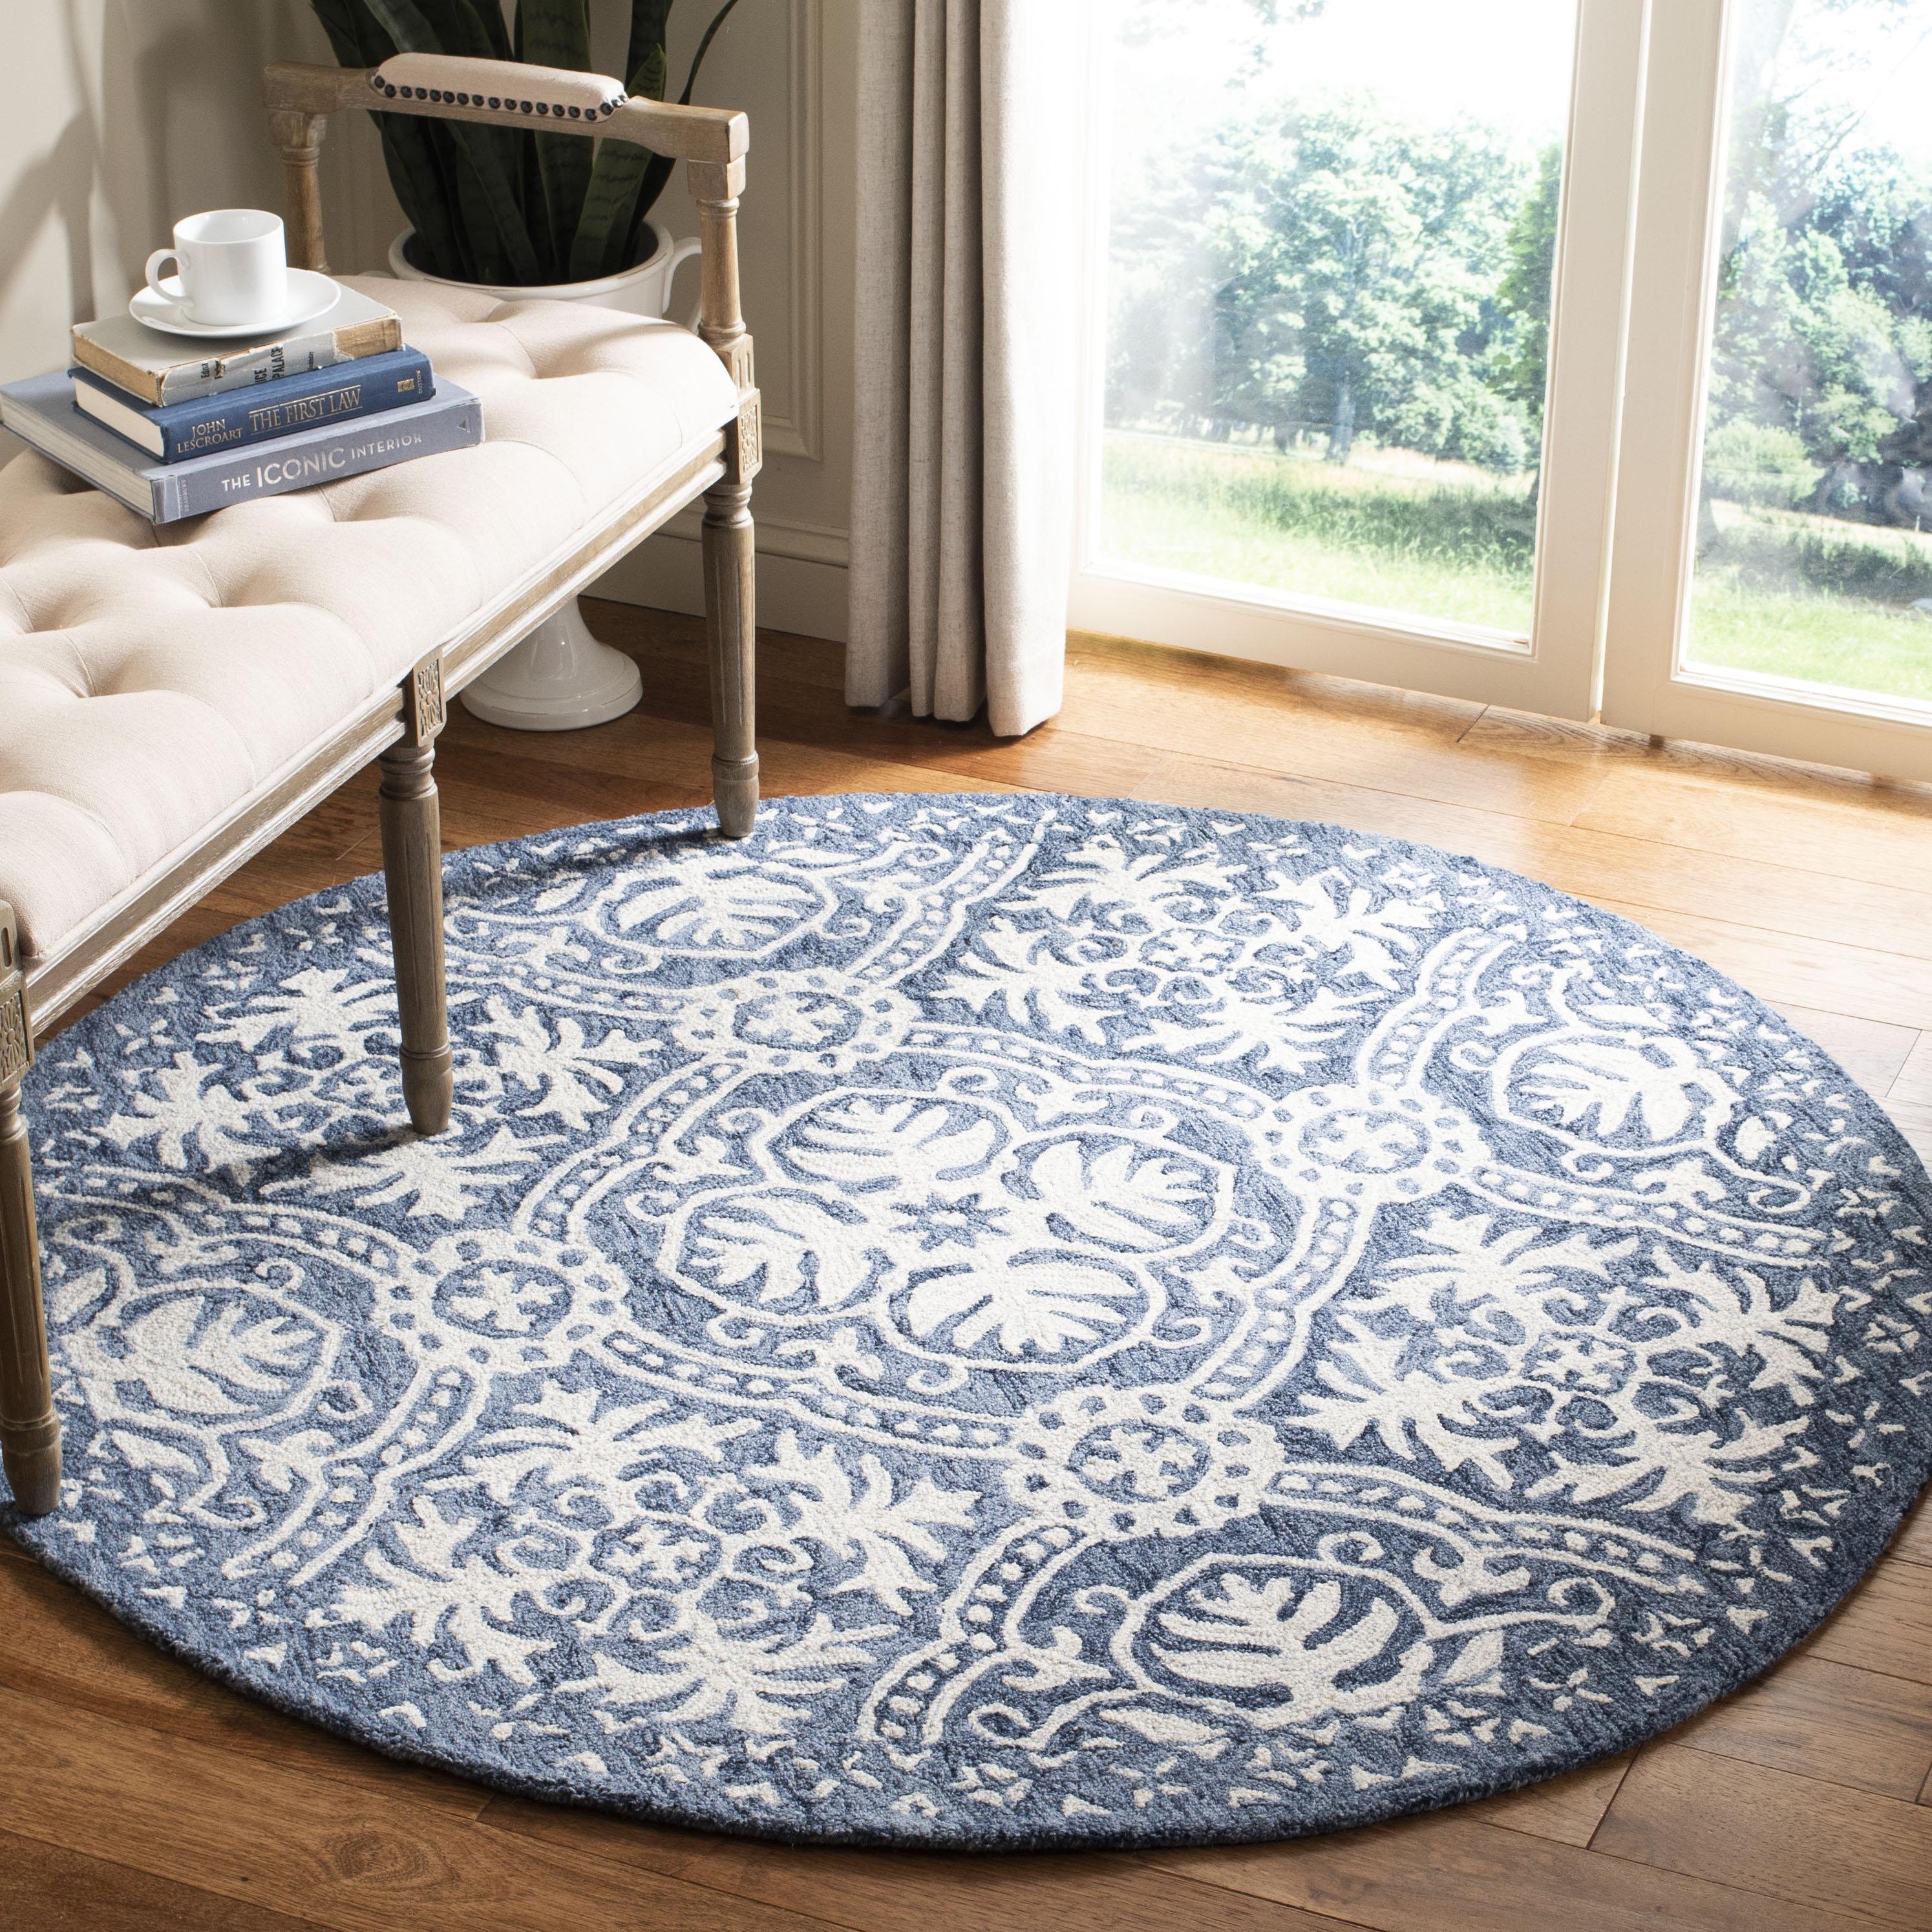 Essence 606 5' X 5' Round Blue Wool Rug